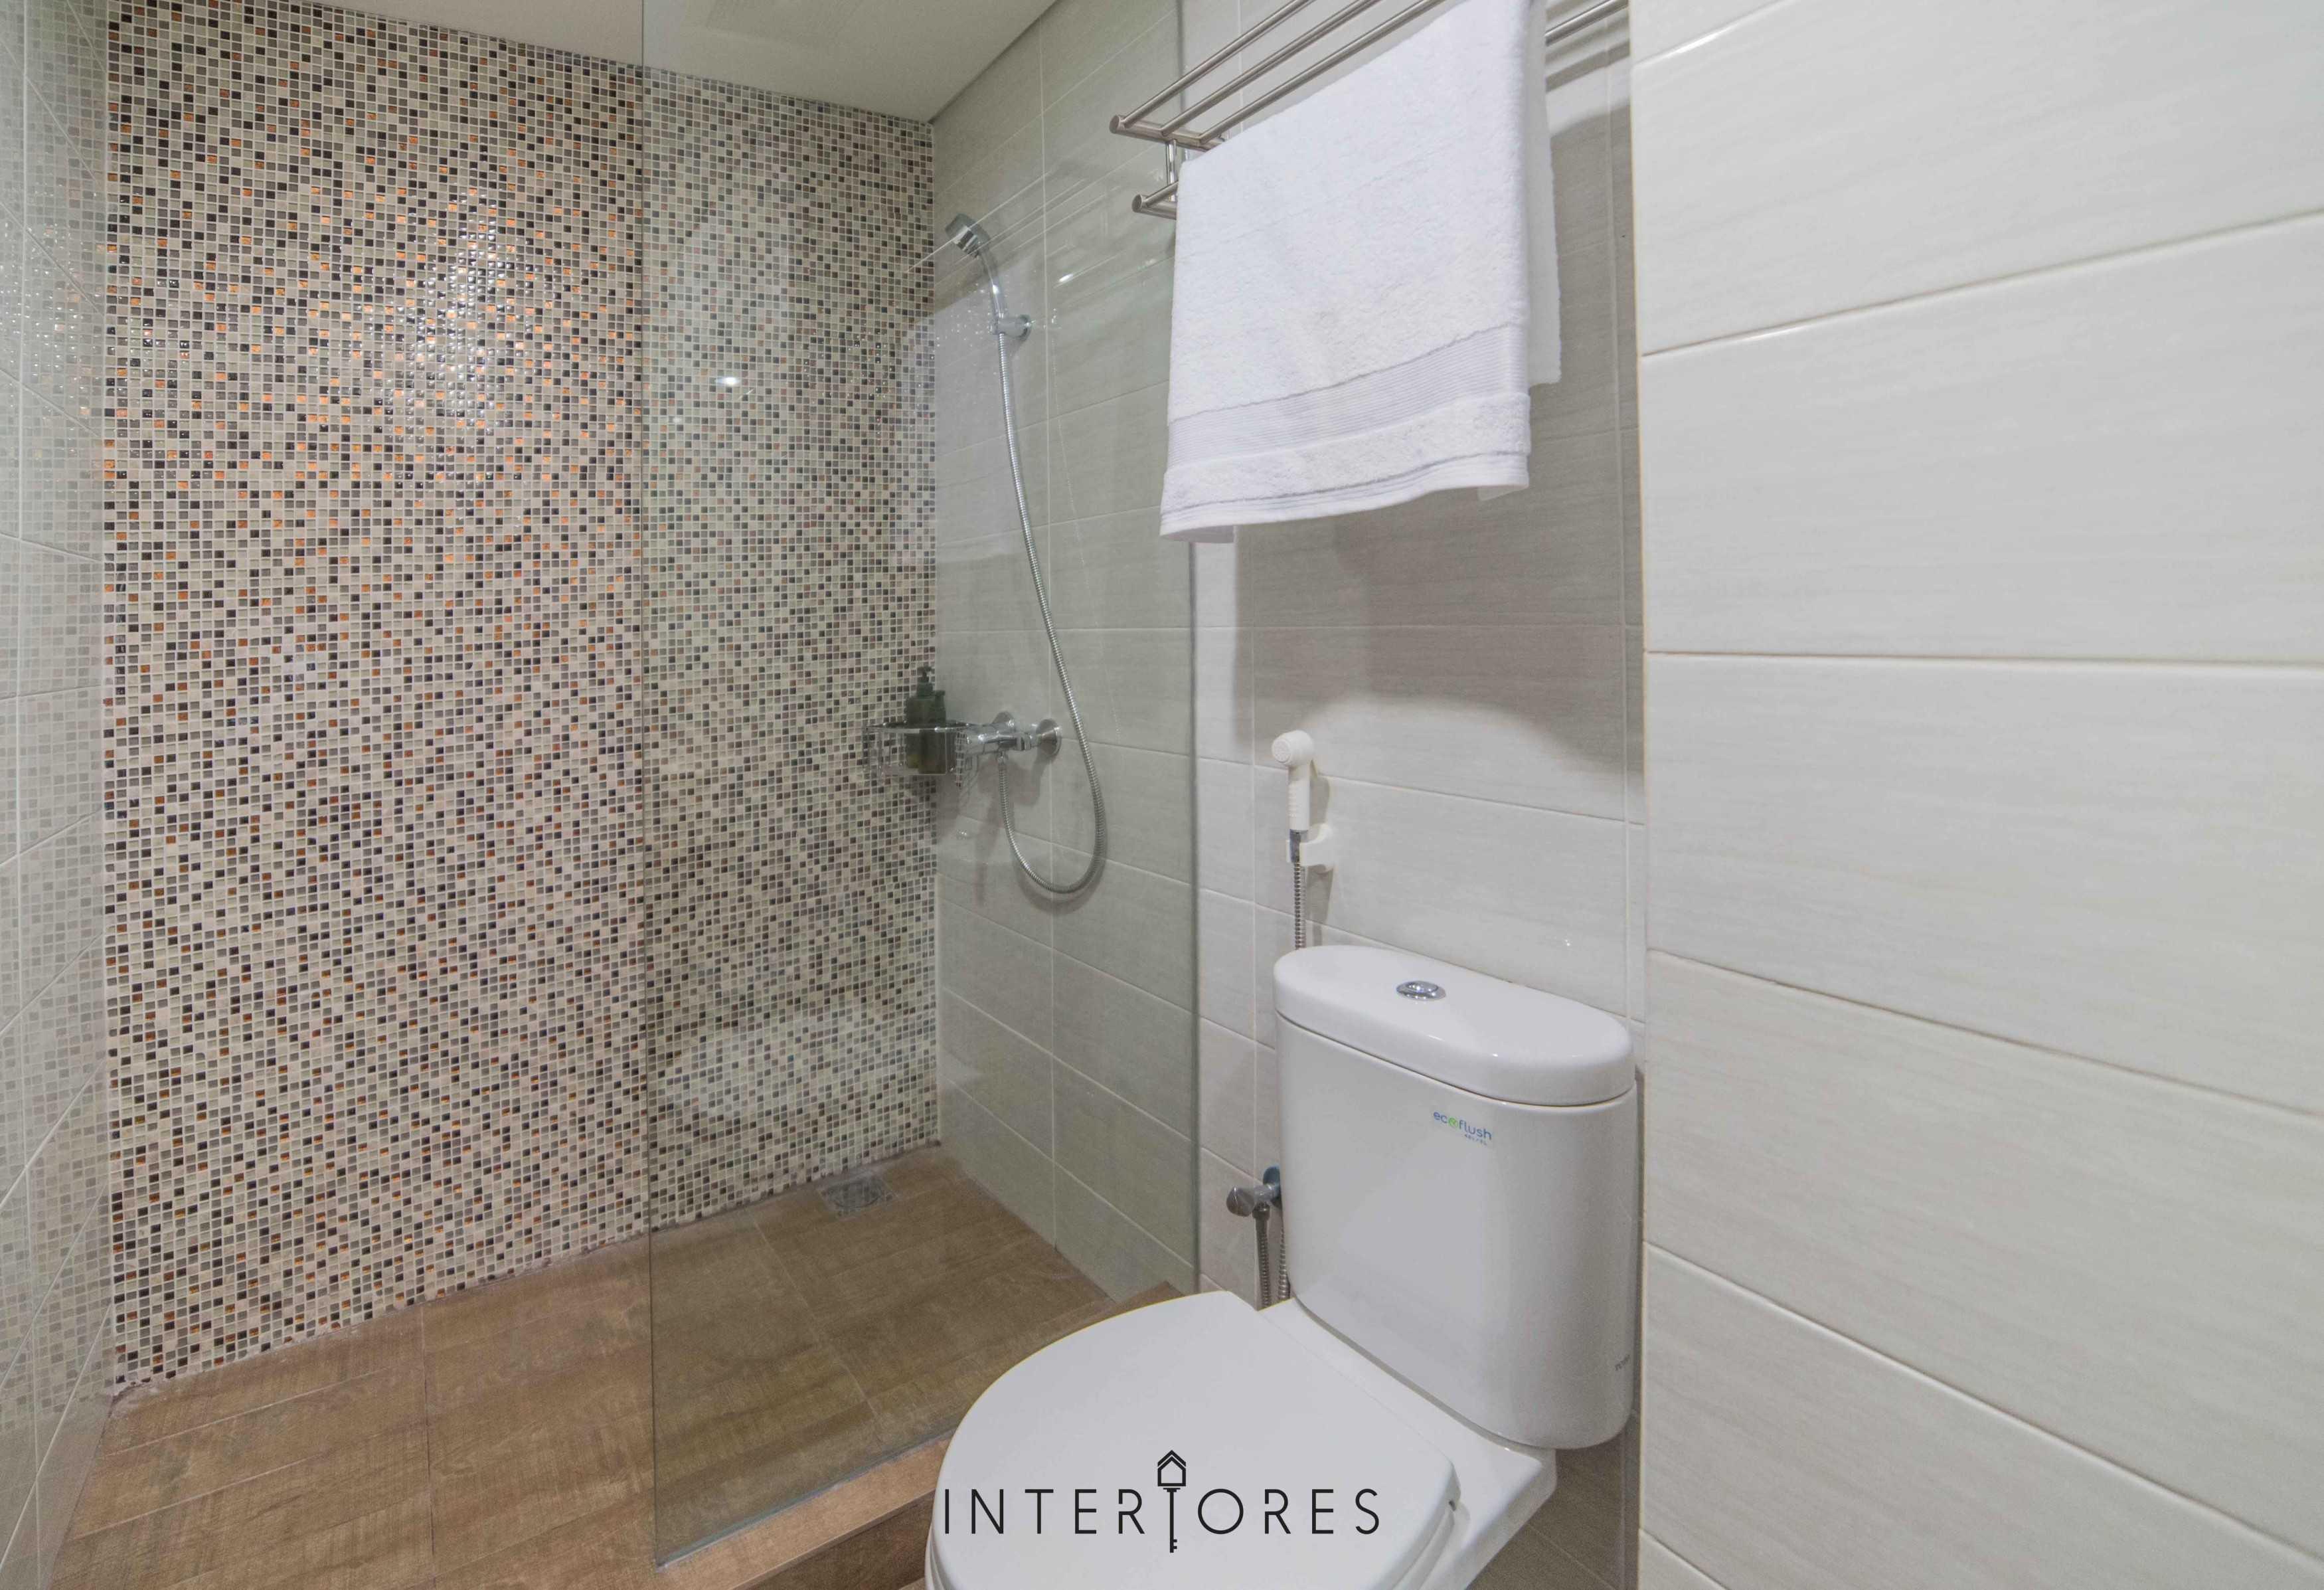 Interiores Interior Consultant & Build Studio 06C3 Kemang Village, Jakarta Selatan Kemang Village, Jakarta Selatan Bathroom Modern  17700